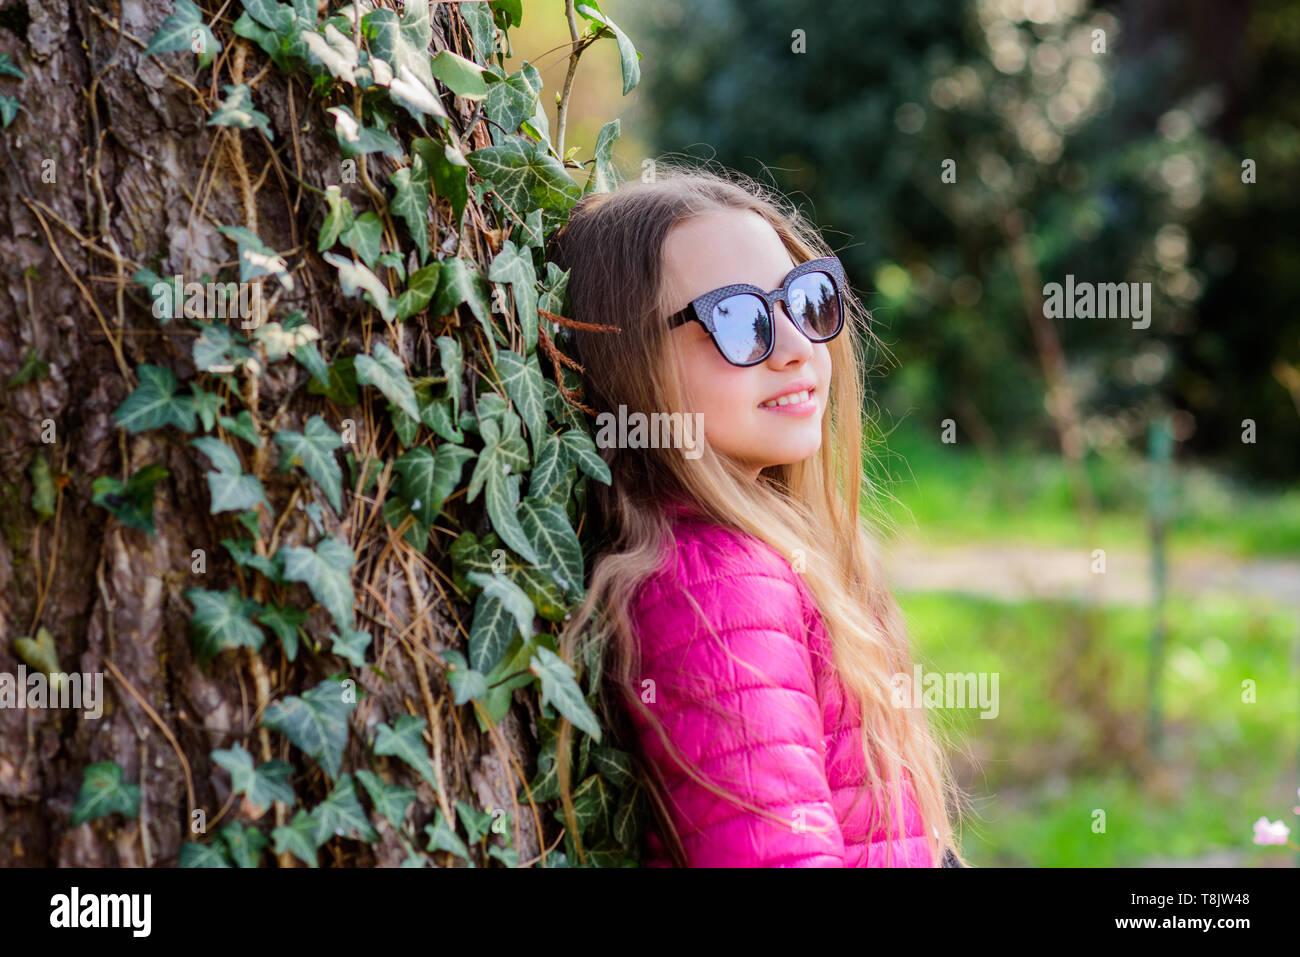 Pleasant relaxing walk in garden. Peaceful environment garden. Girl walk in botanical garden. Enjoying nature in garden. Kid cute fancy child spend time in park. Plants grown for display to public. - Stock Image